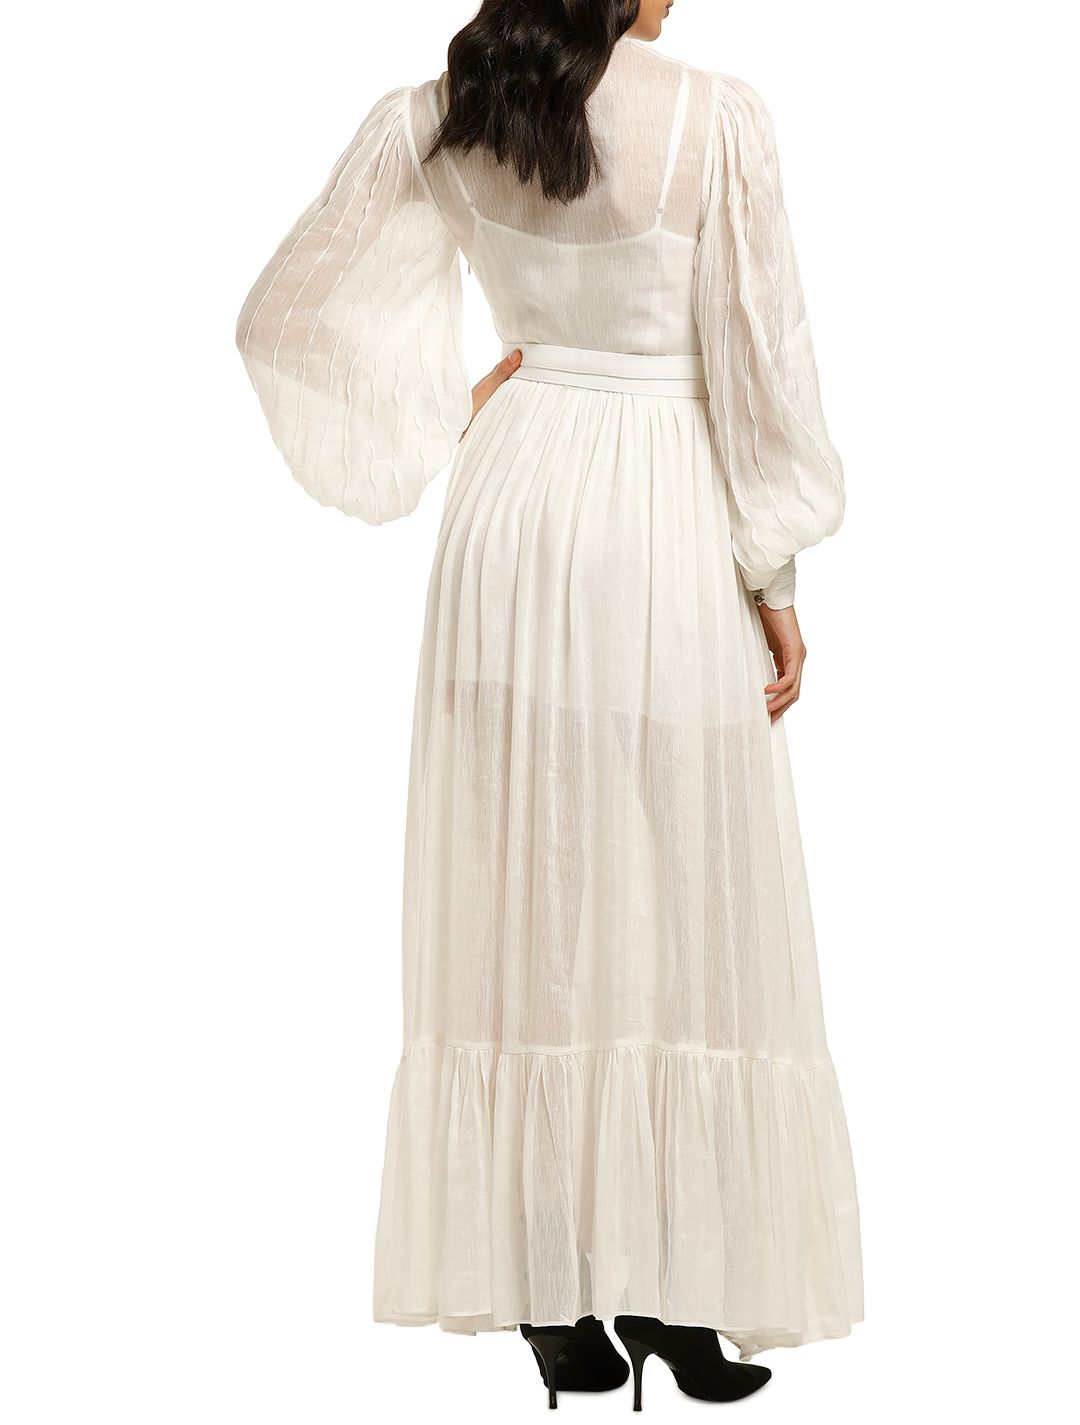 Leo-and-Lin-Serenity-Linen-Dress-White-Back